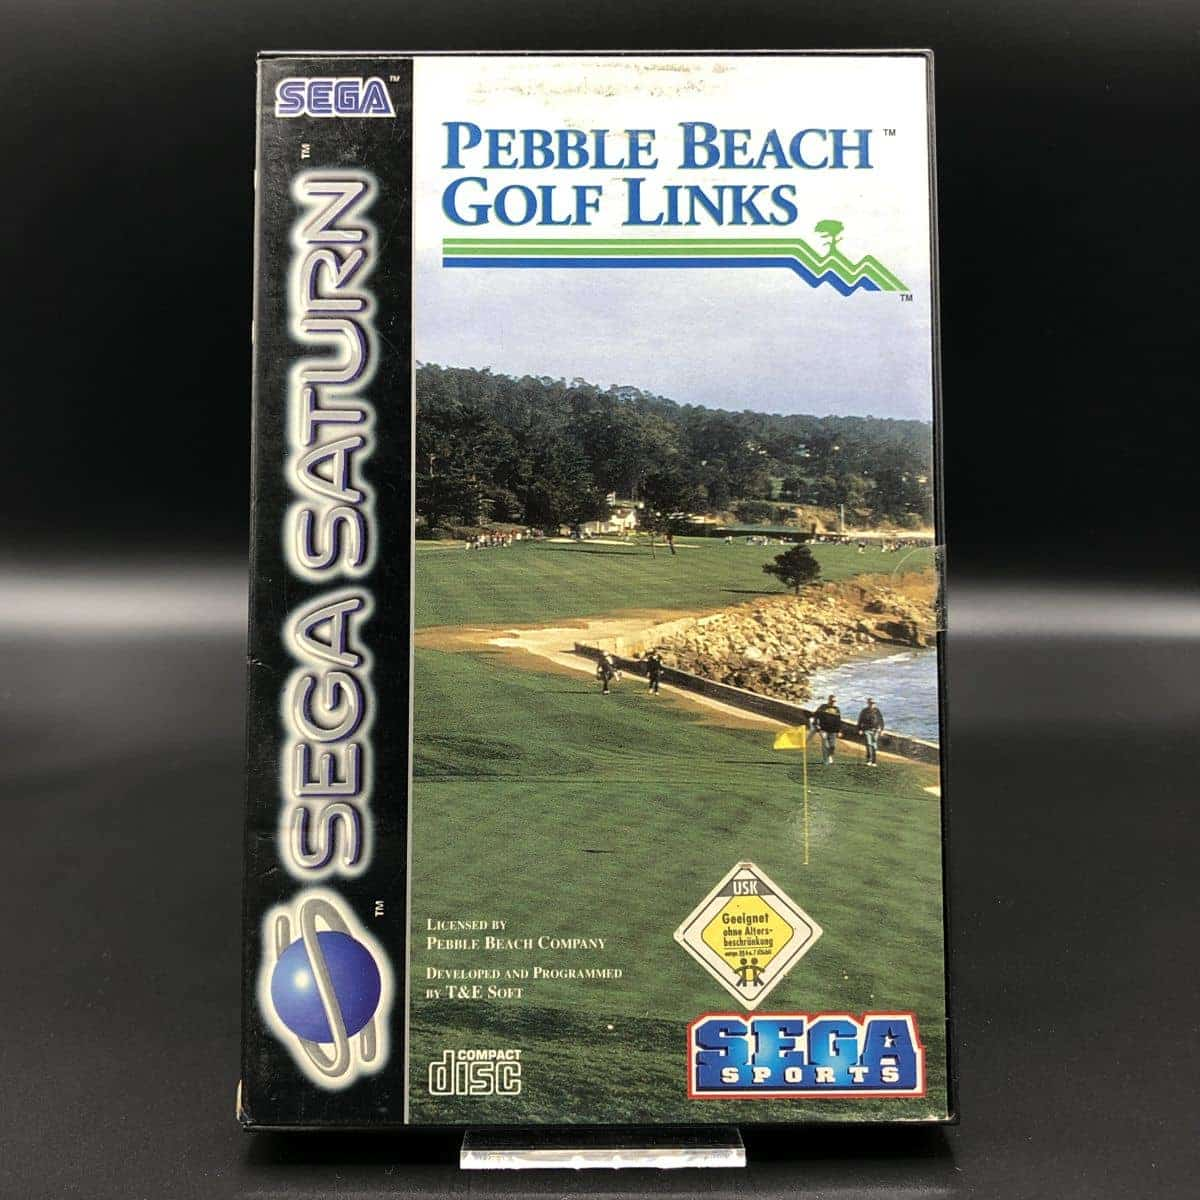 Pebble Beach Golf Links (Komplett) (Gut) Sega Saturn